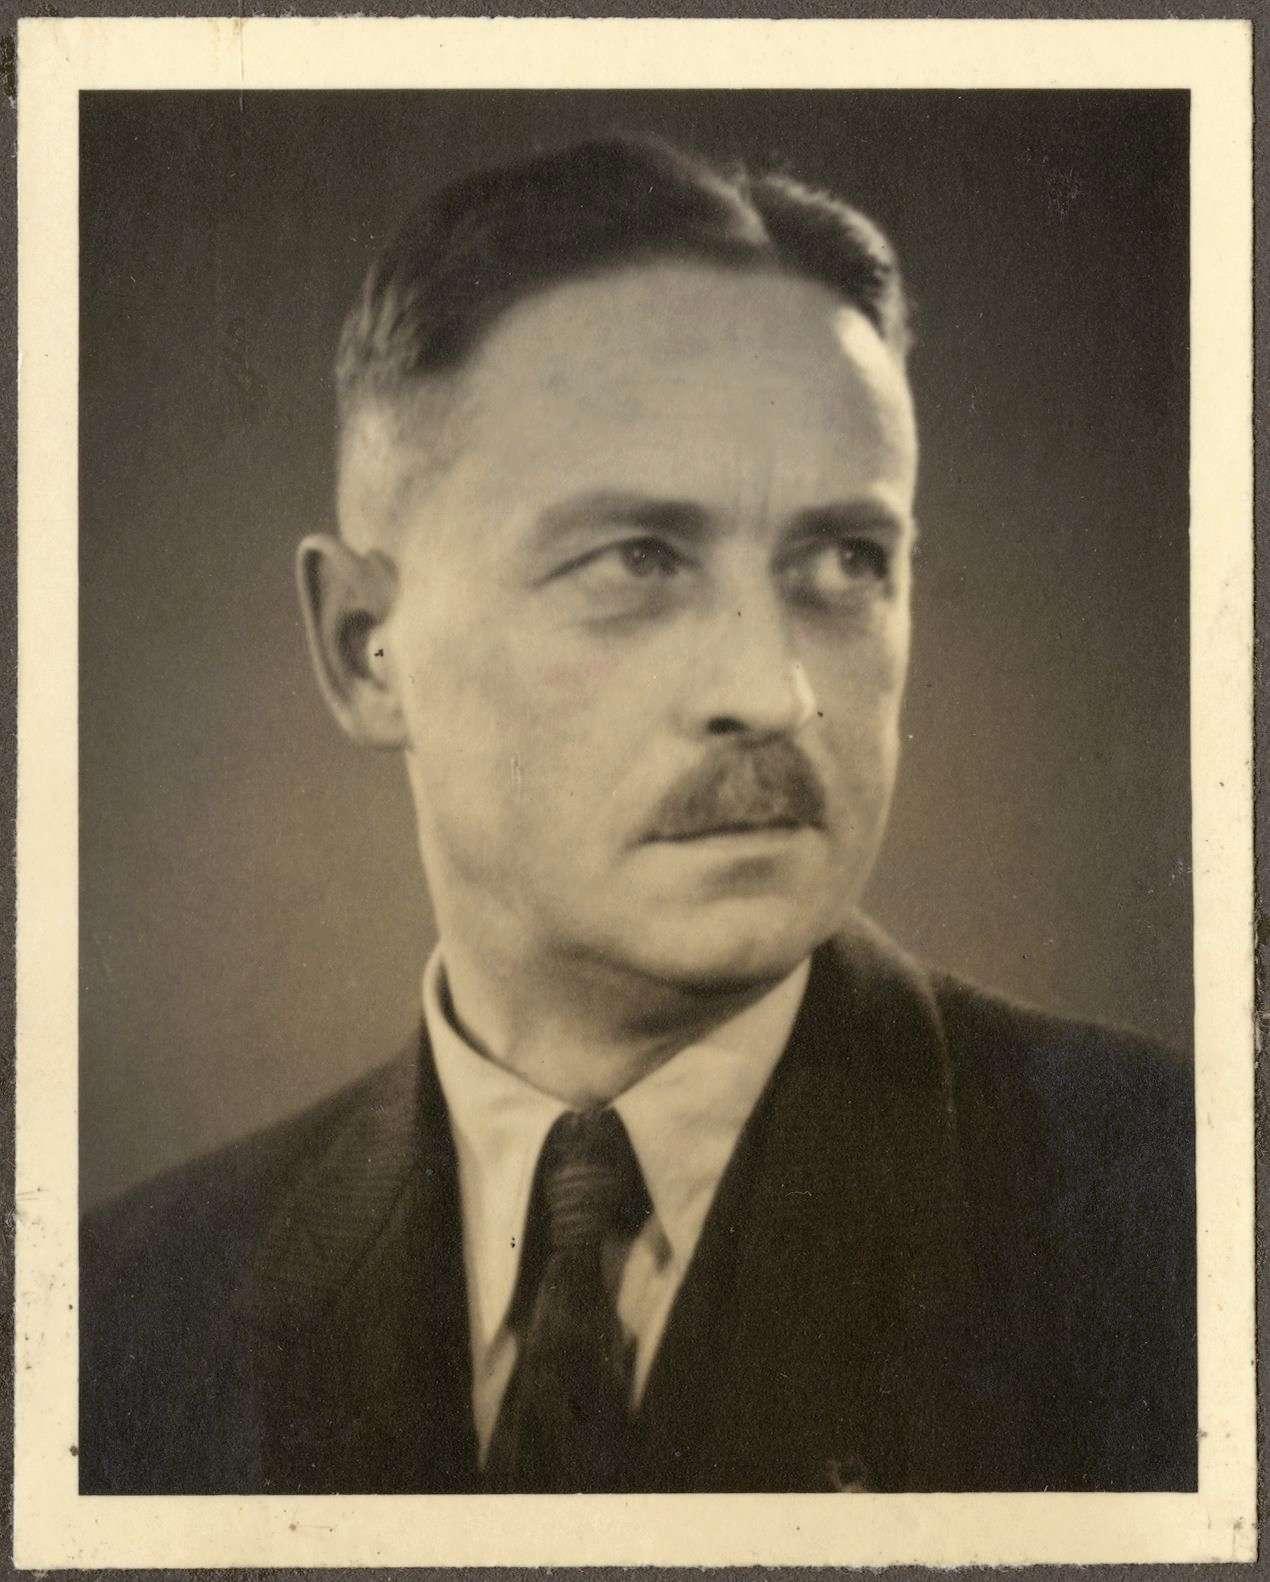 Ziegler, Albrecht, Bild 1